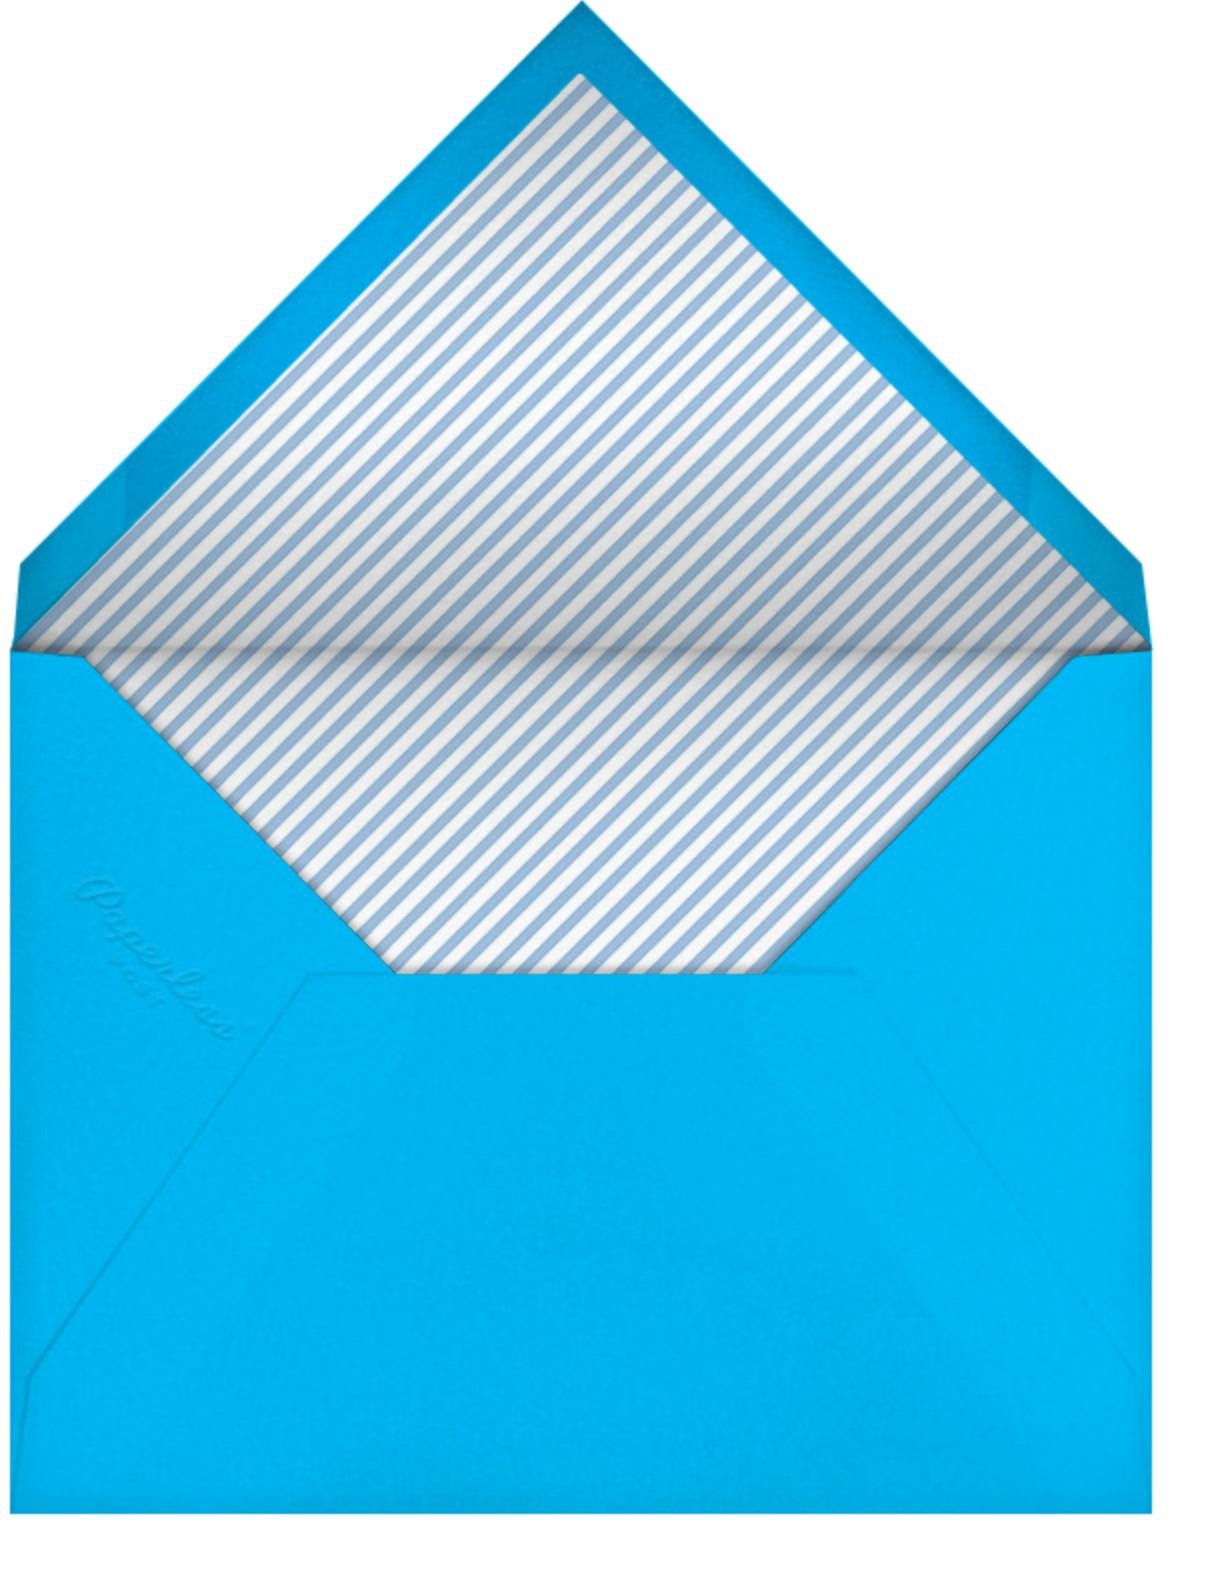 Papel Picado (Photo) - Capri - Paperless Post - Bachelorette party - envelope back